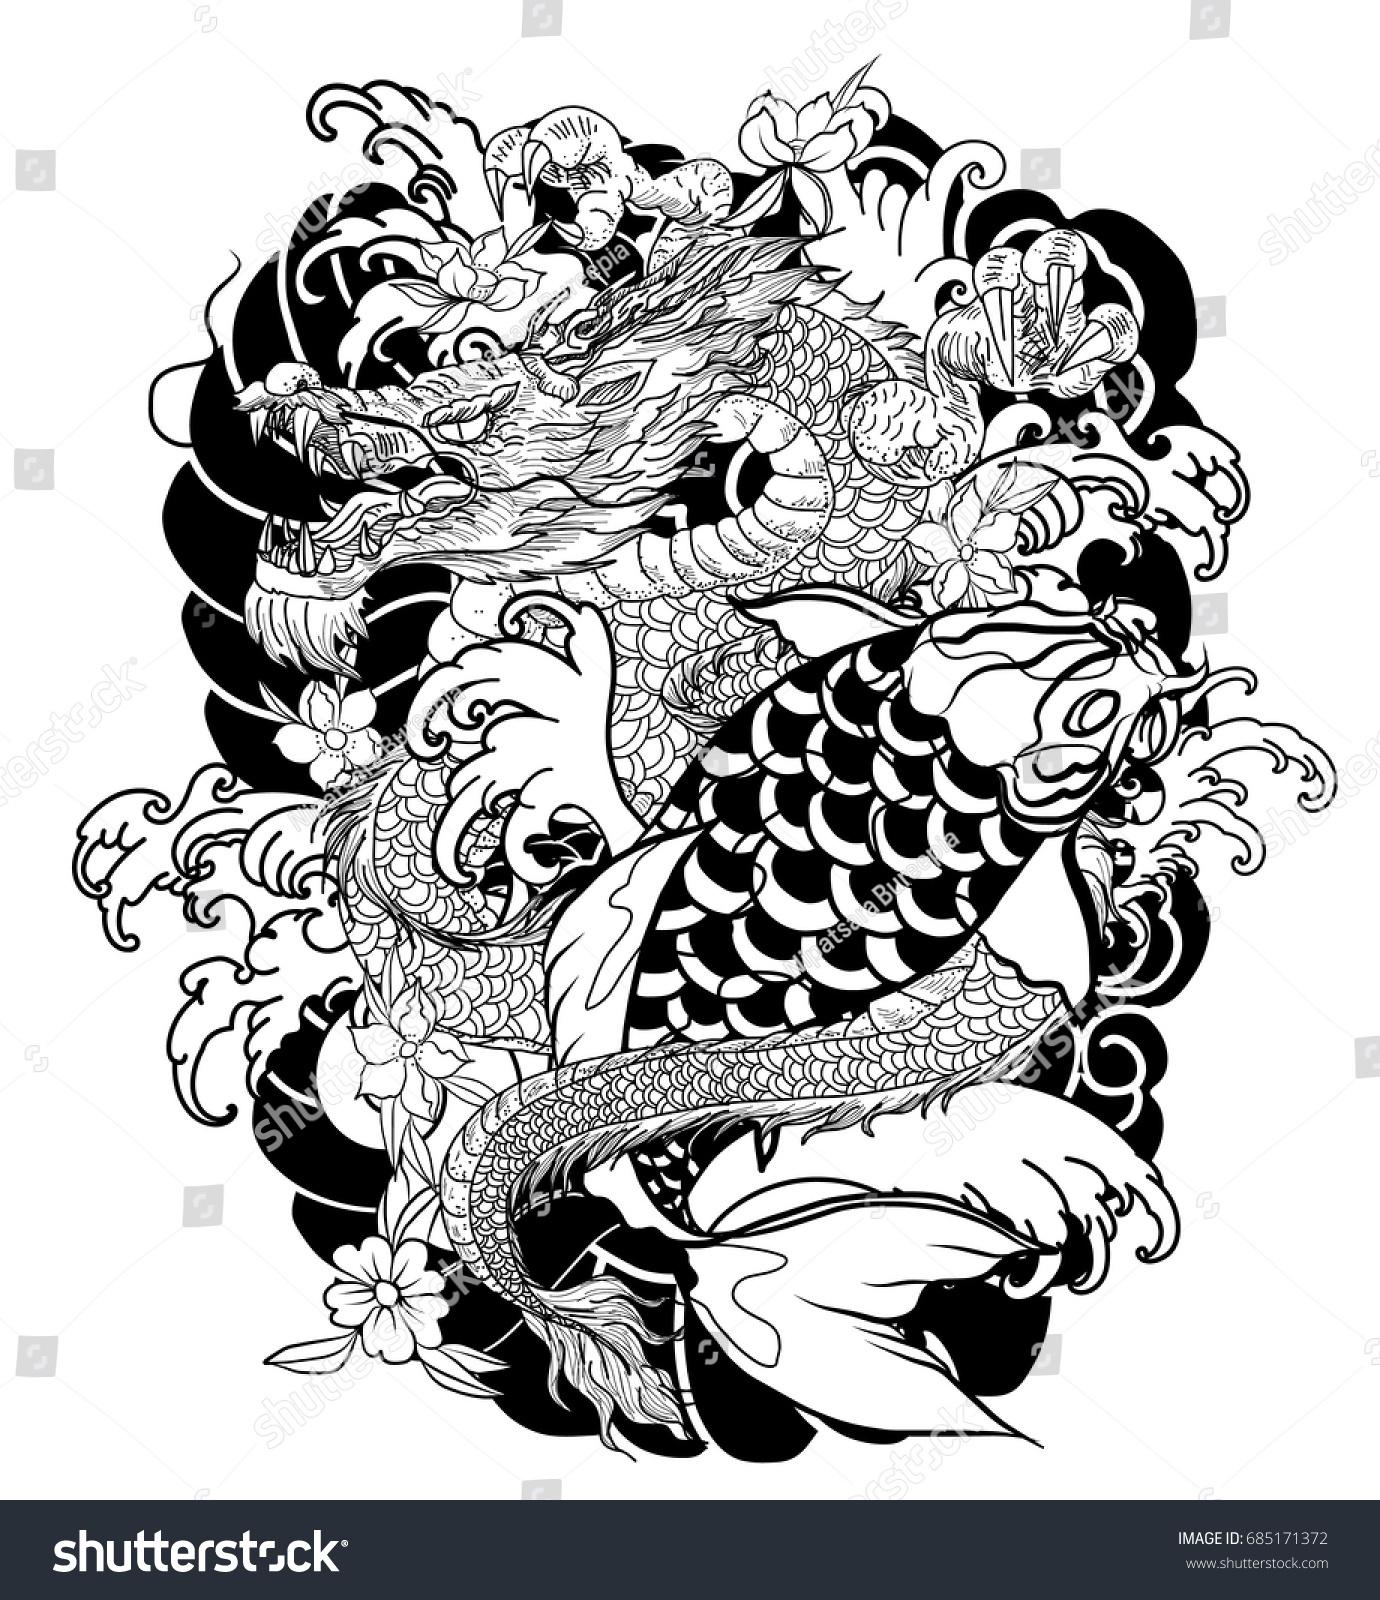 hand drawn dragon koi fish flower stock vector 685171372 shutterstock. Black Bedroom Furniture Sets. Home Design Ideas